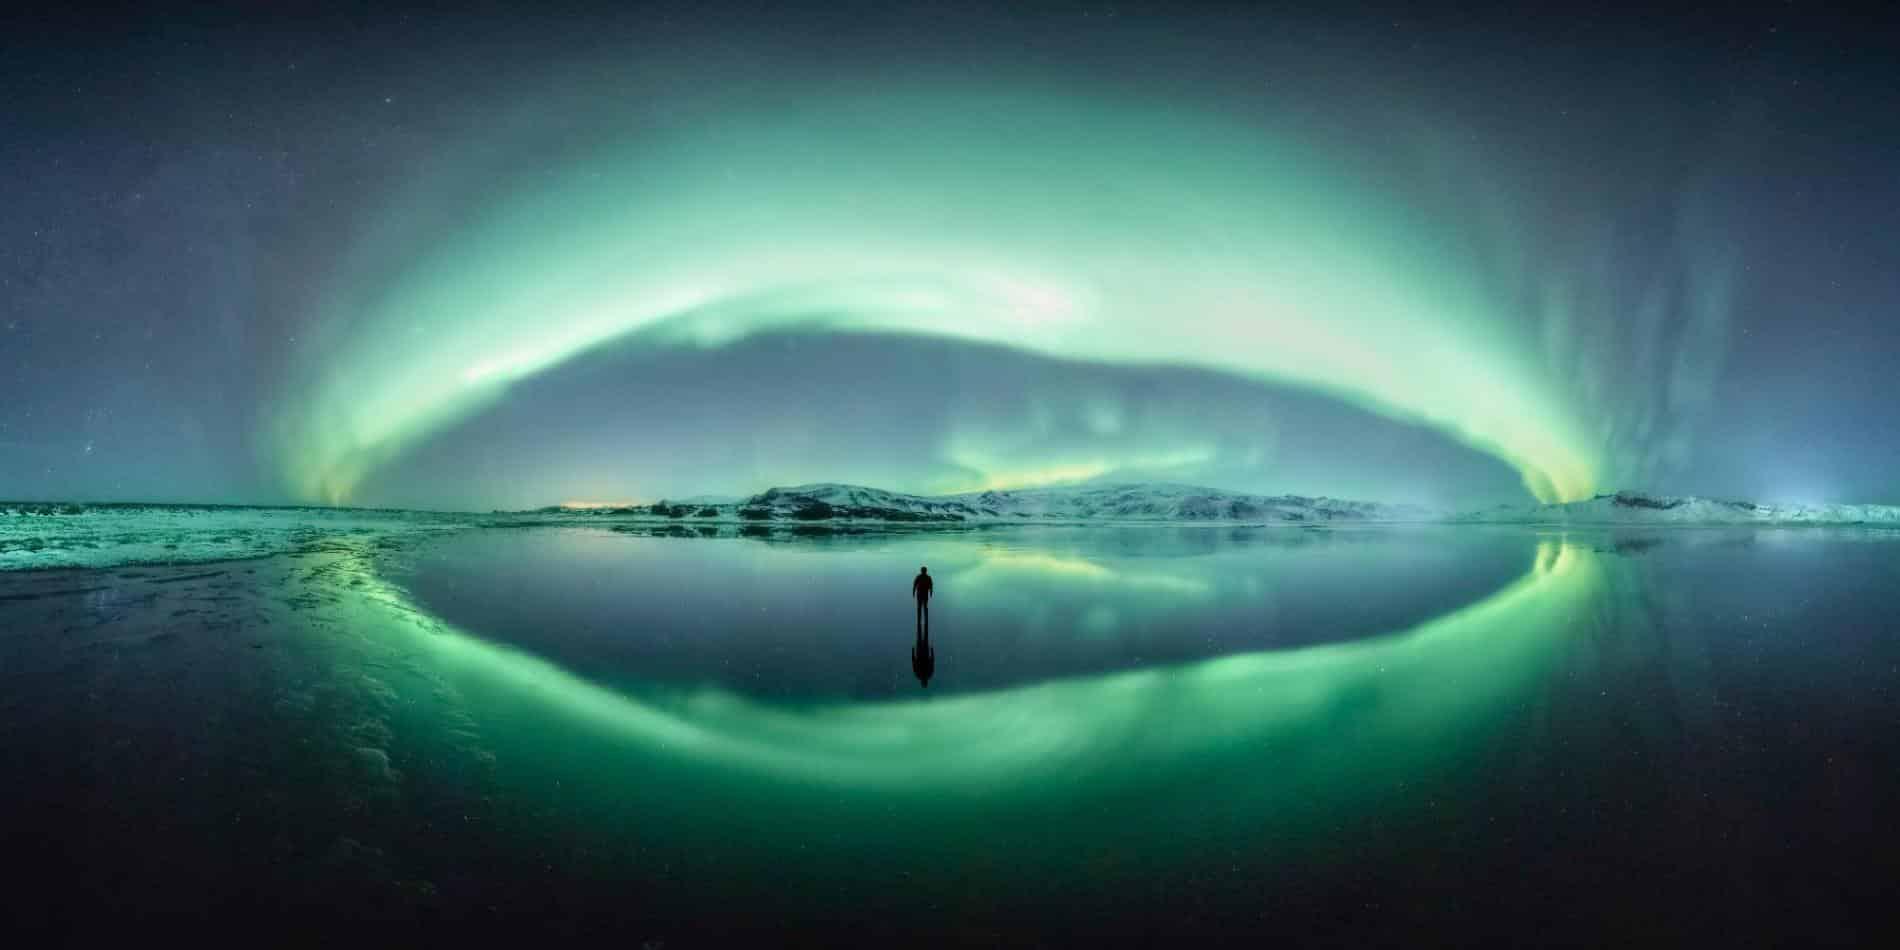 Iceland Vortex by Larryn Rae